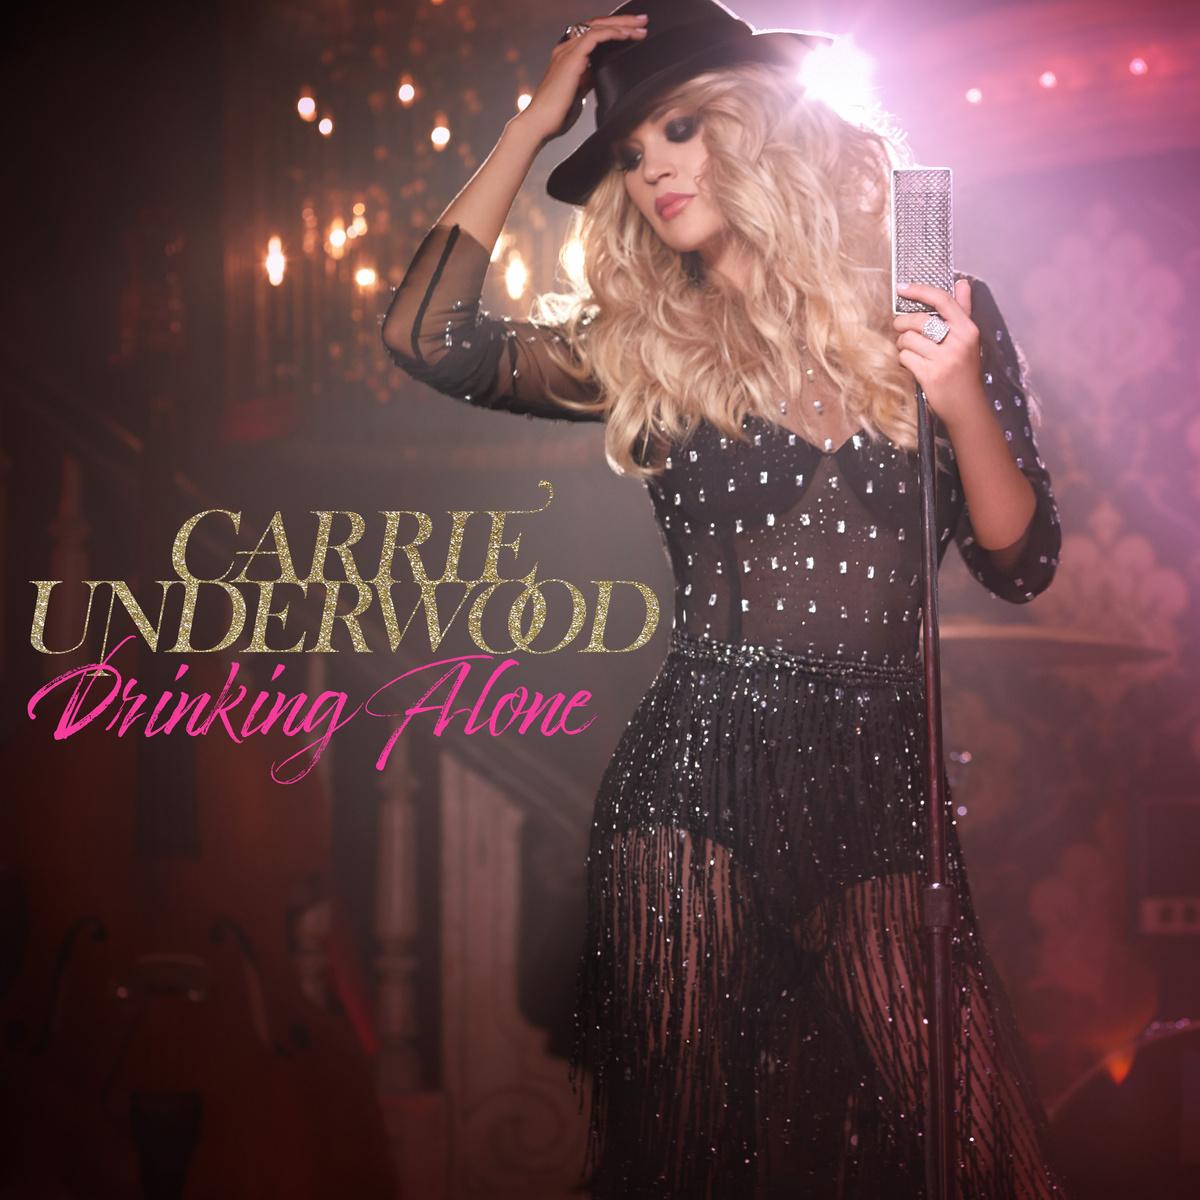 carrie-underwood-drinking